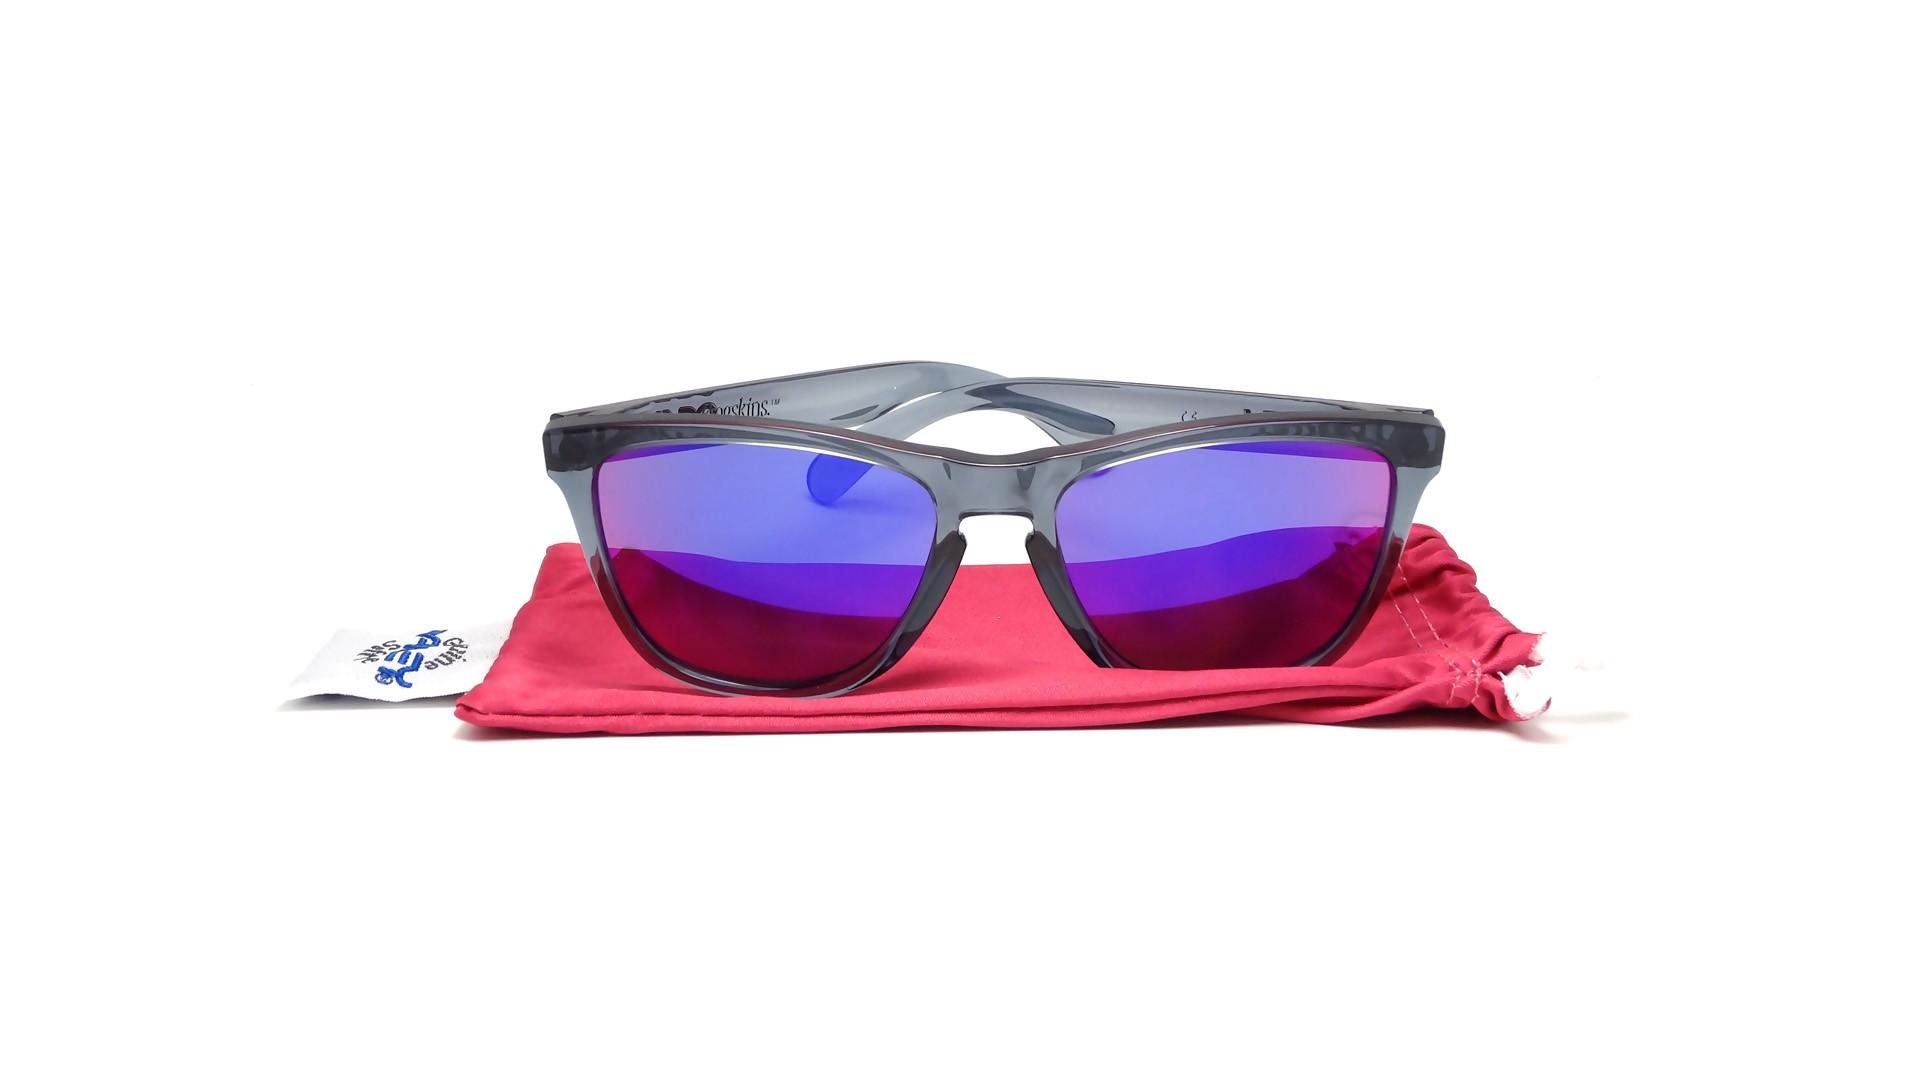 410a31e7259 Oakley Frogskin Crystal Black L Violet Iridium « Heritage Malta